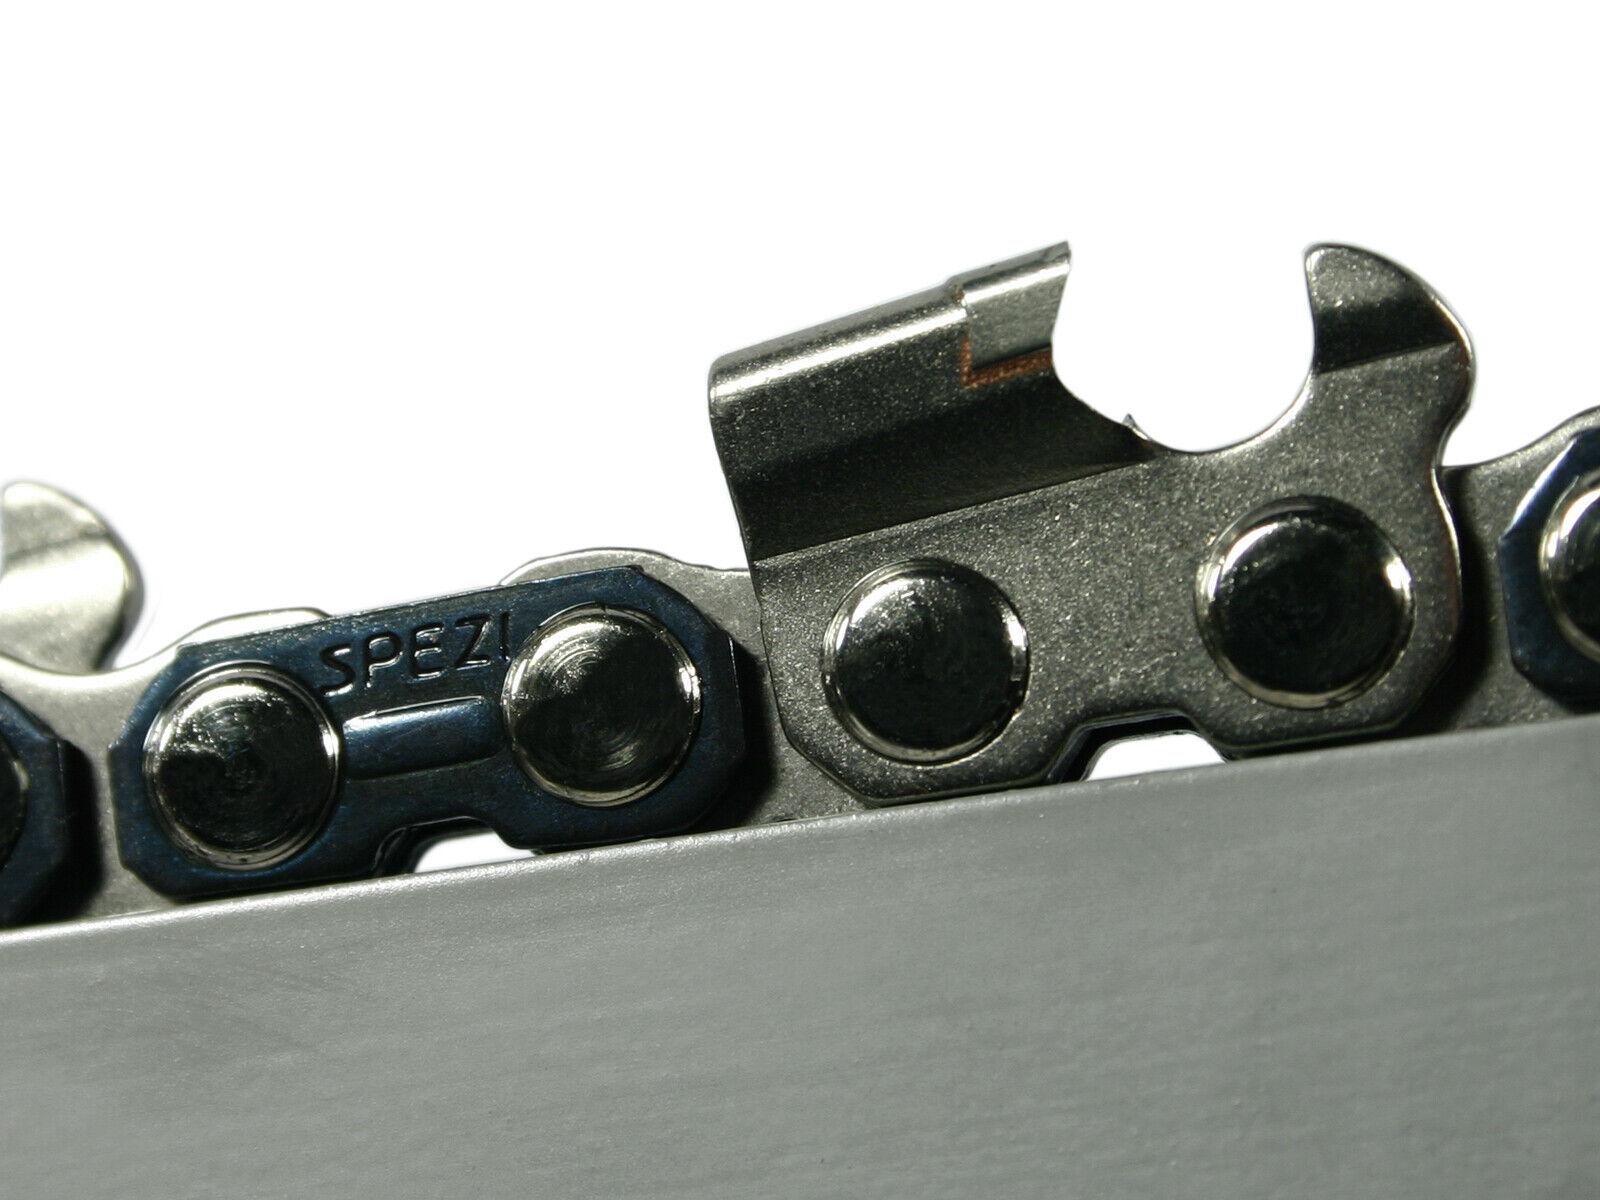 Metal duro cadena sierra adecuado para Husqvarna 2101 70 cm 3 8  92 TG 1,5 mm Cochebide